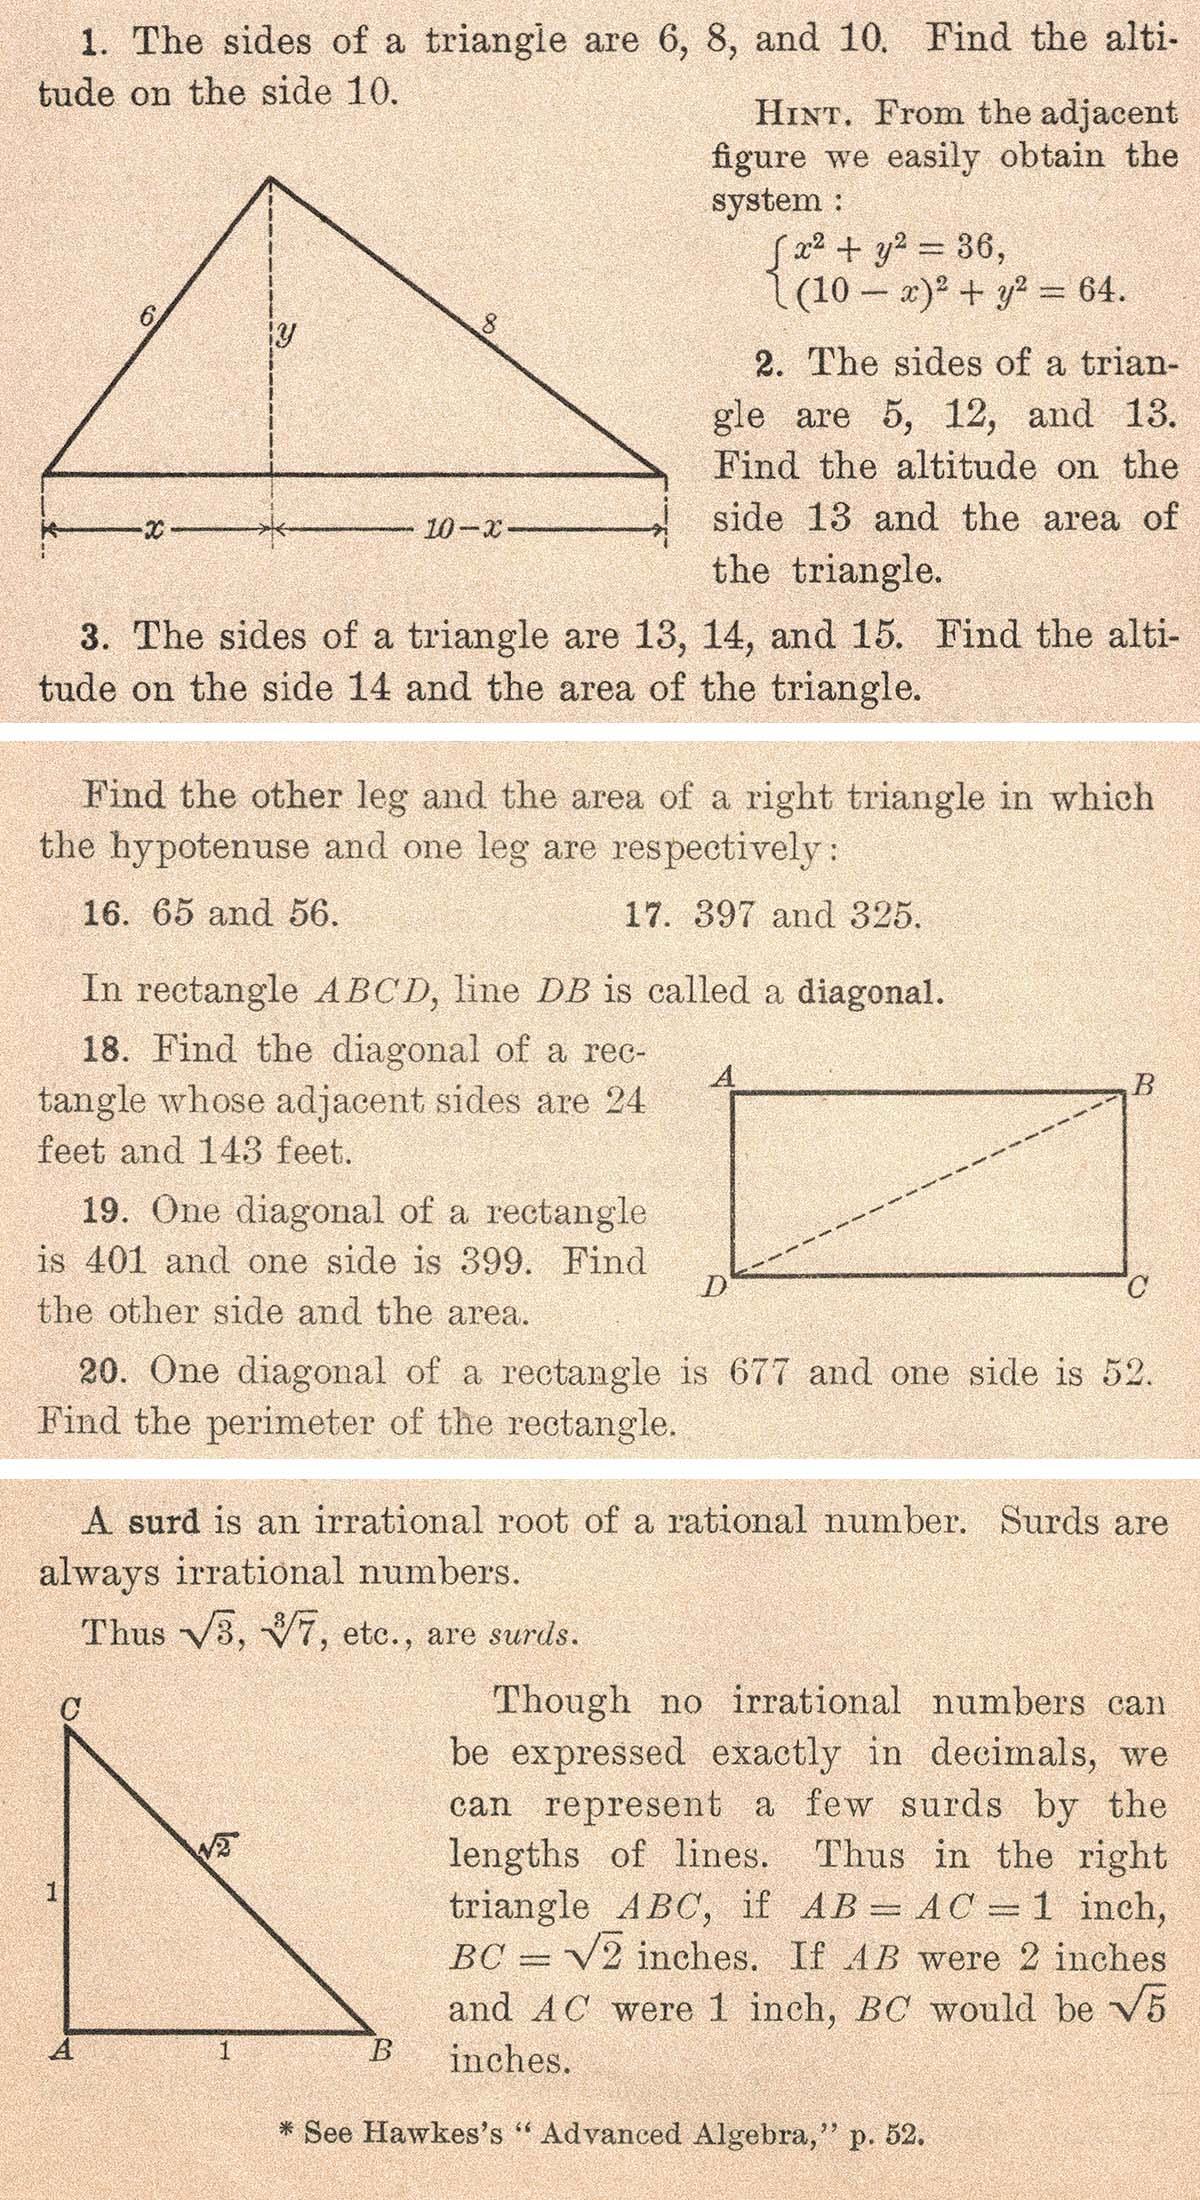 Vintage Algebra Textbook Geometric Problems Illustrations Collage